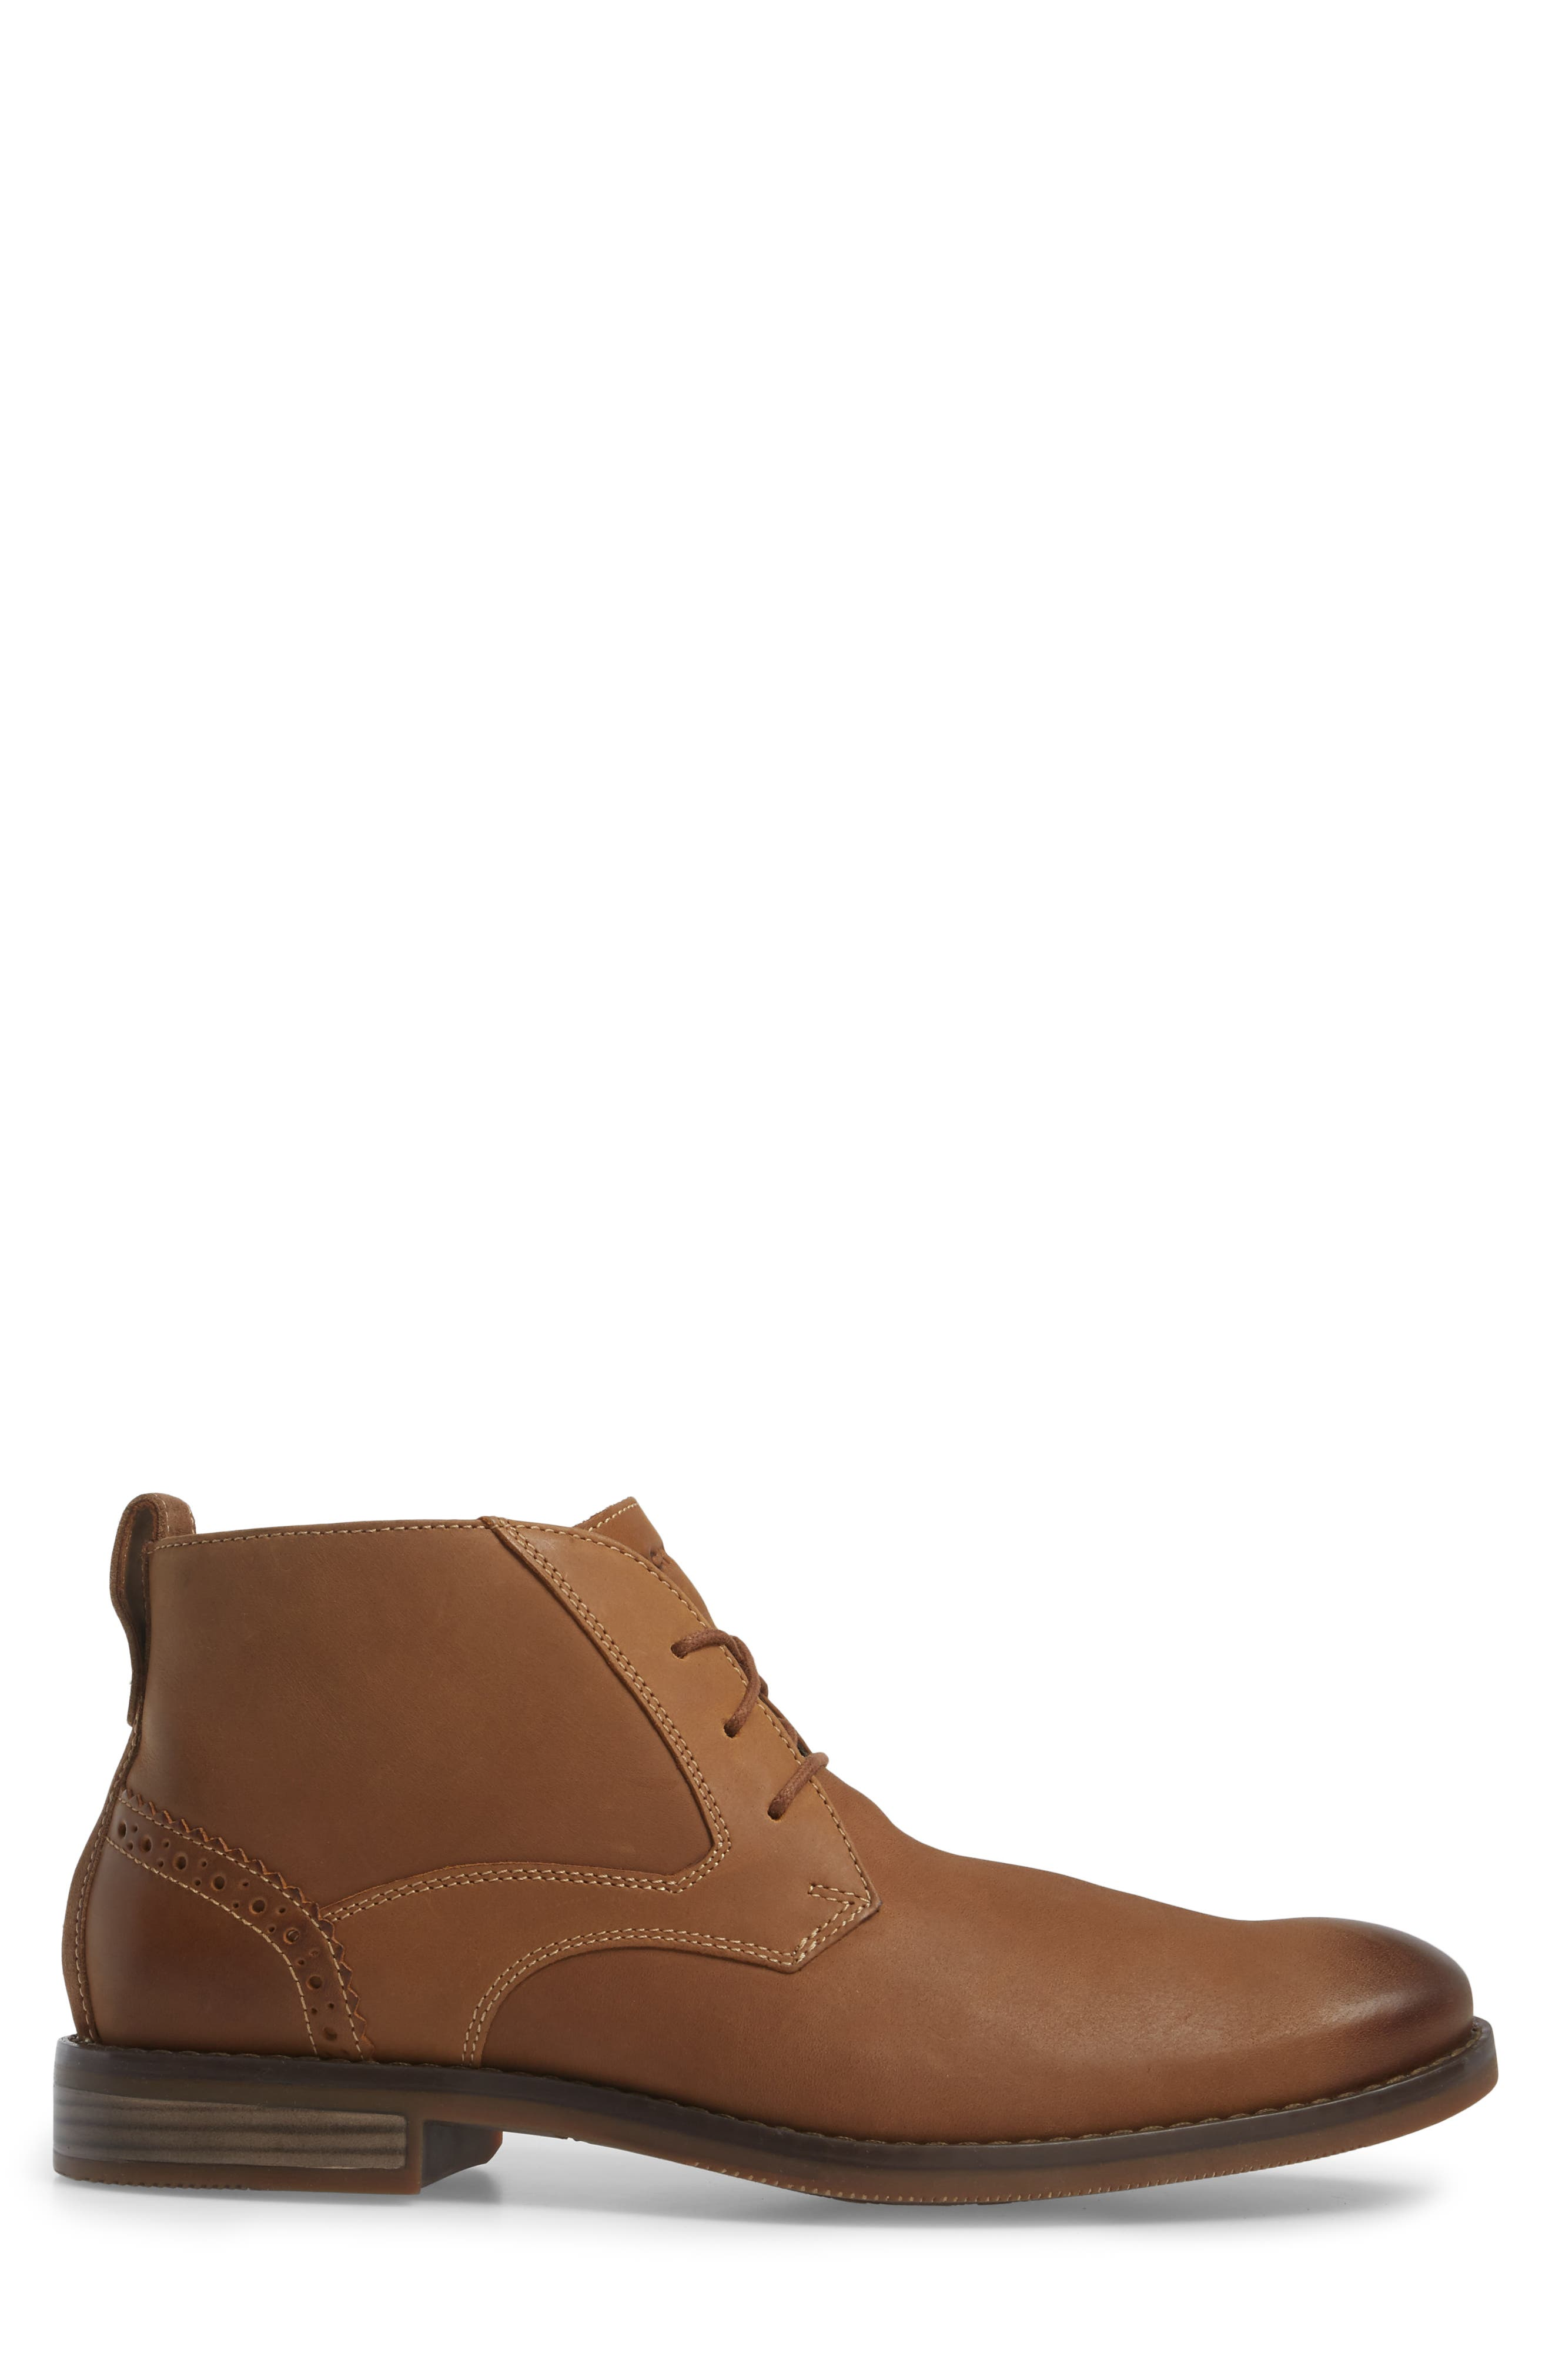 Wynstin Chukka Boot,                             Alternate thumbnail 2, color,                             Tobacco Leather